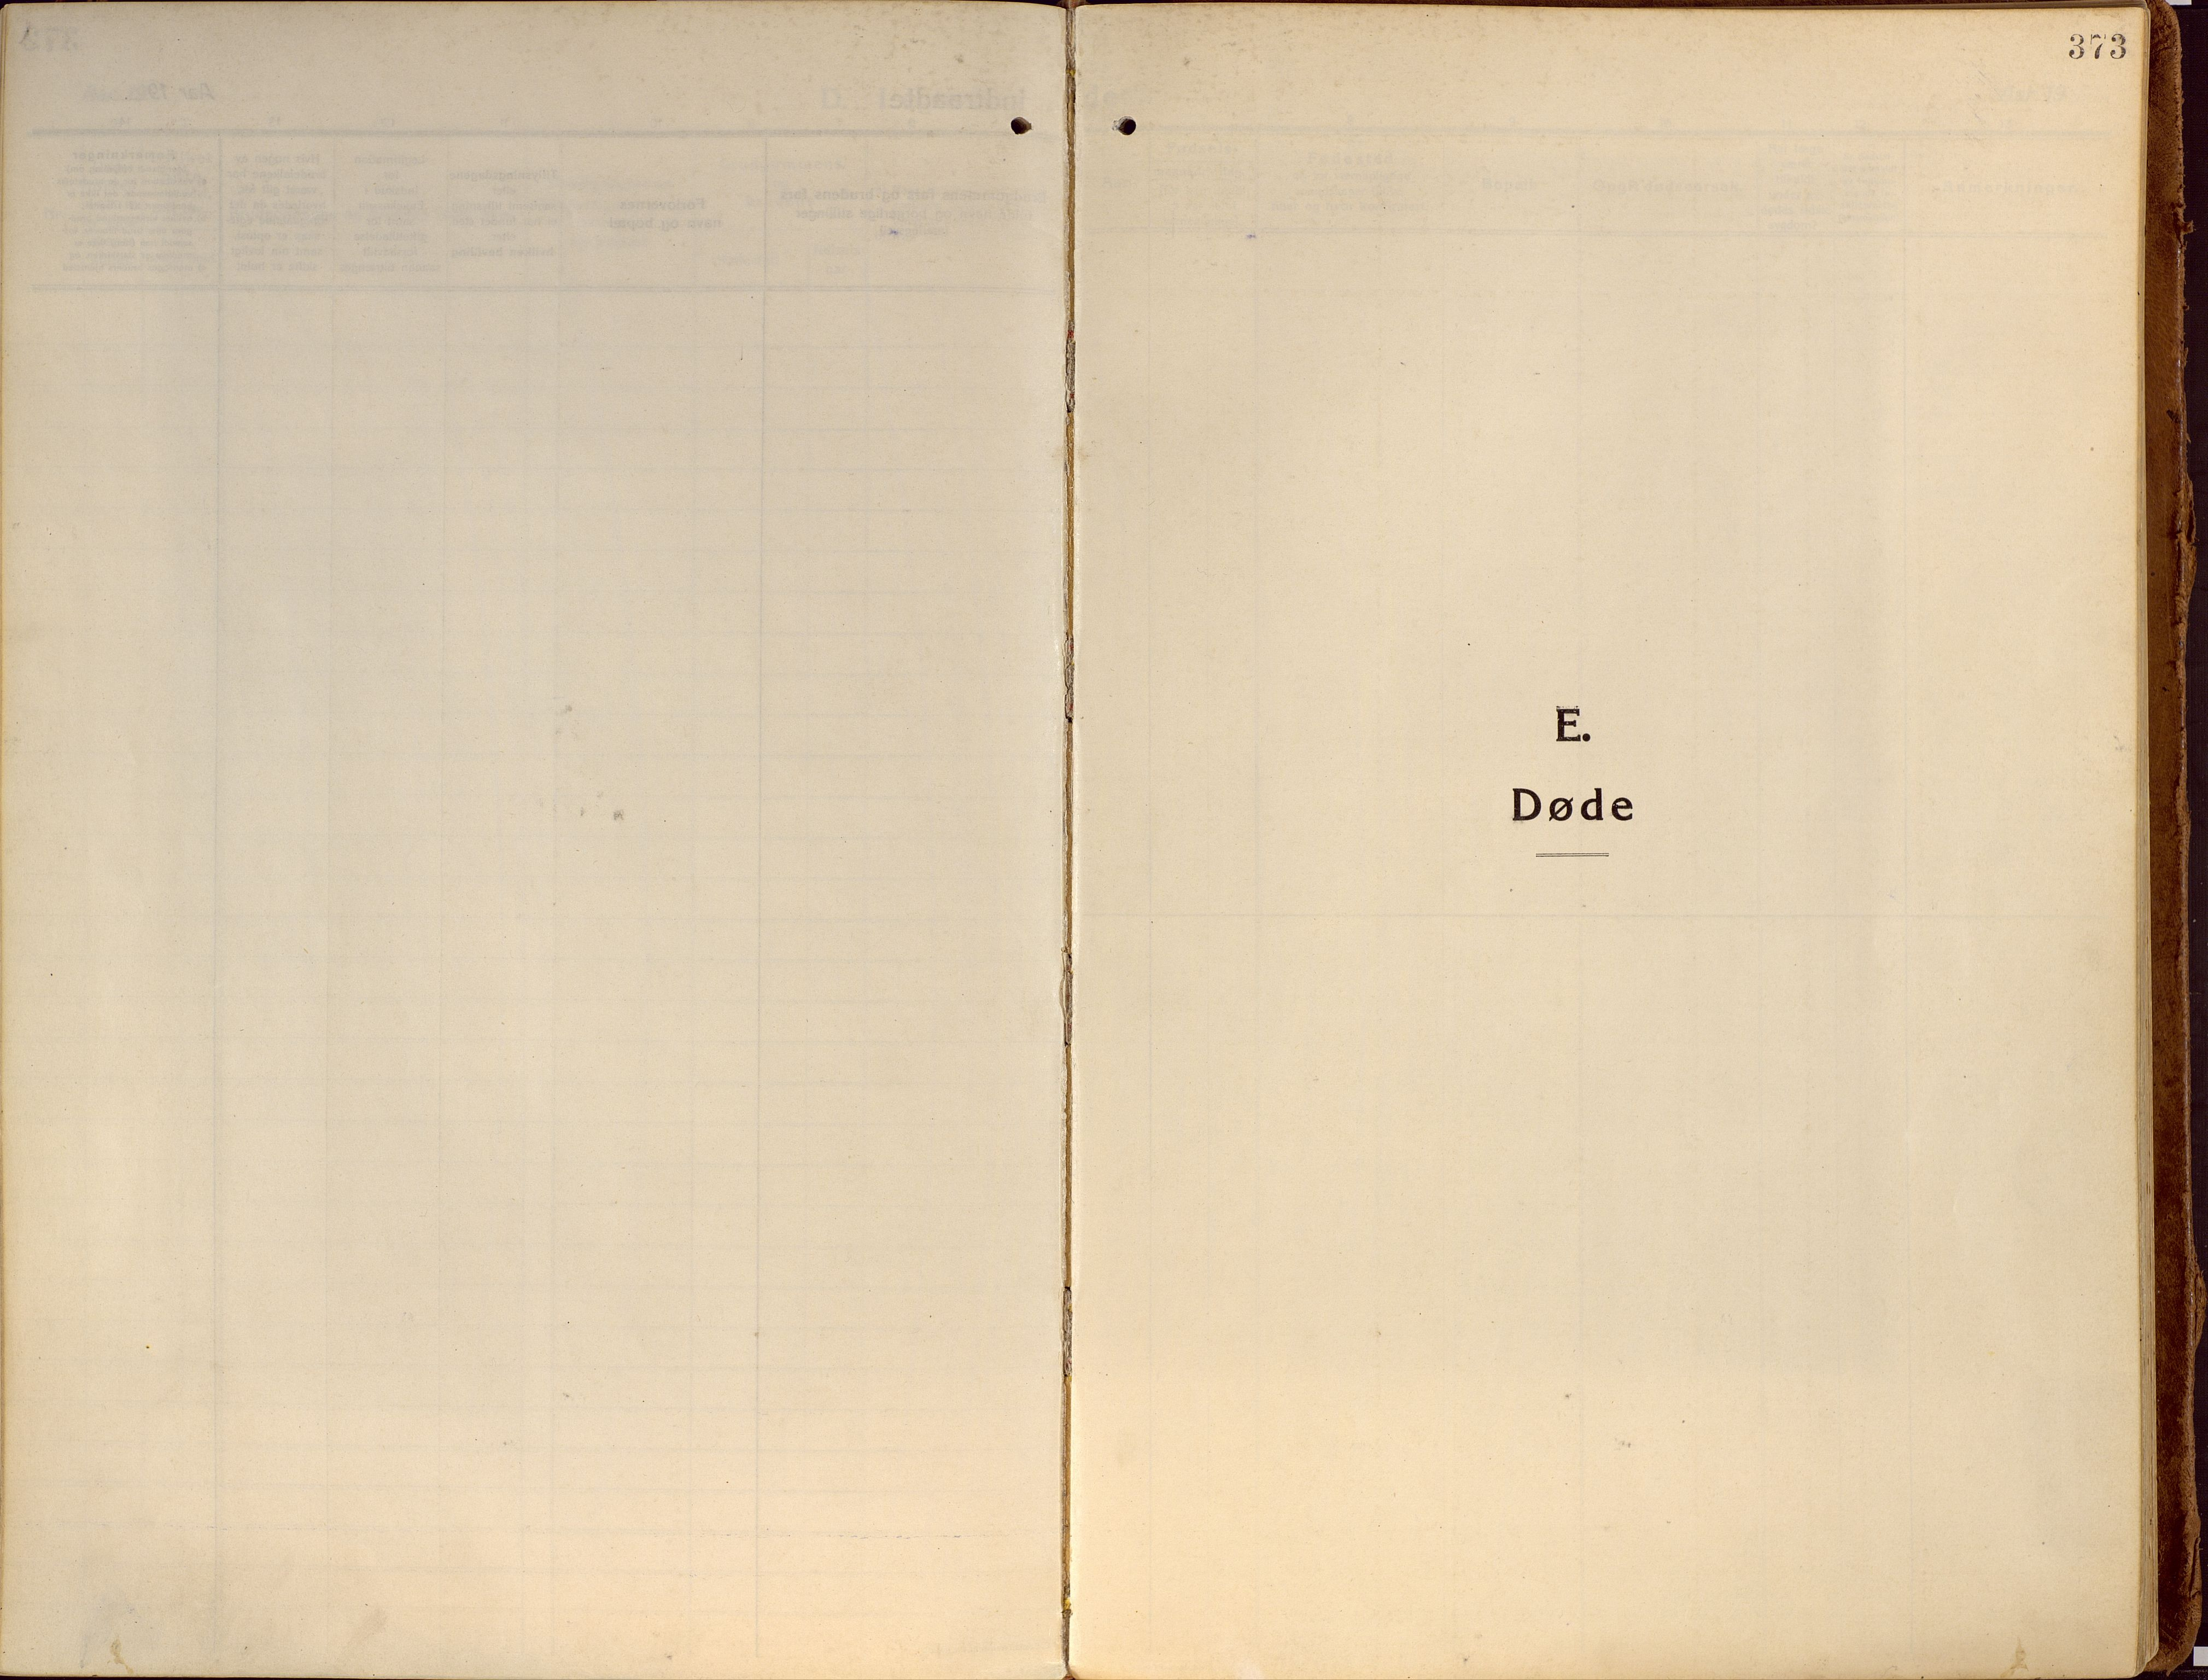 SATØ, Ibestad sokneprestembete, Ministerialbok nr. 18, 1915-1929, s. 373